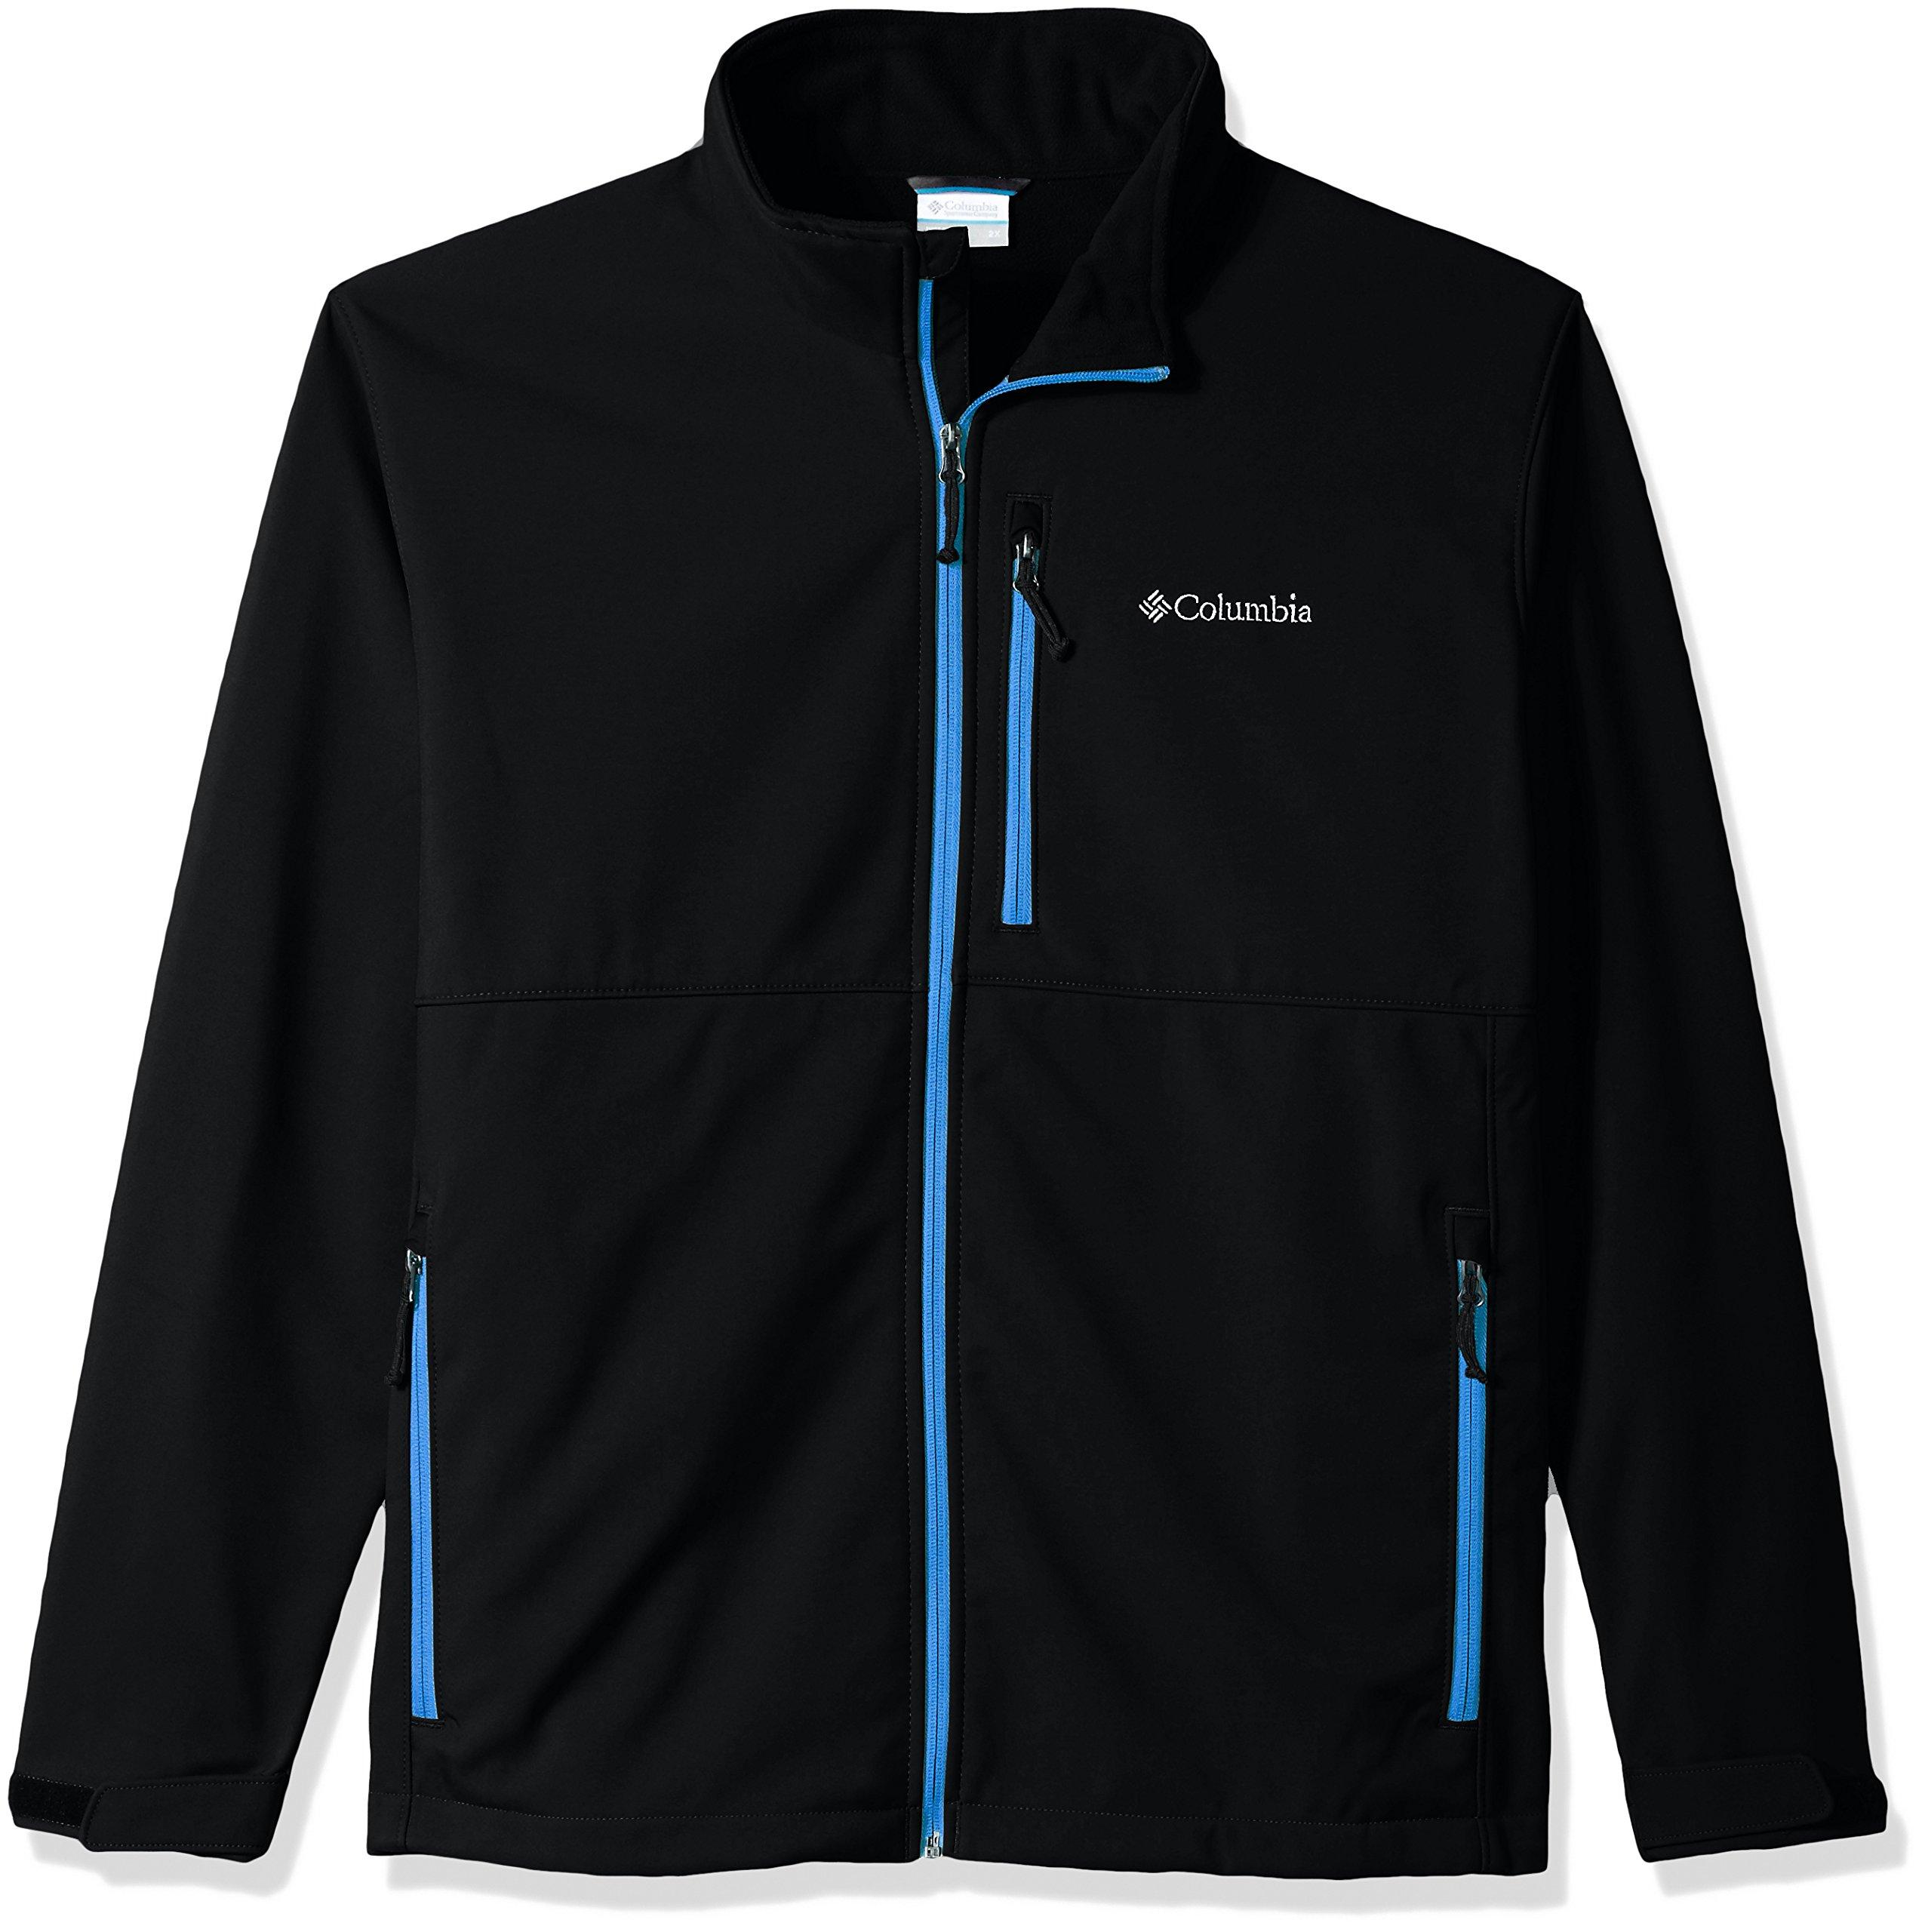 Columbia Men's Big and Ascender Softshell Jacket, Black, Dark Compass, 2X Tall